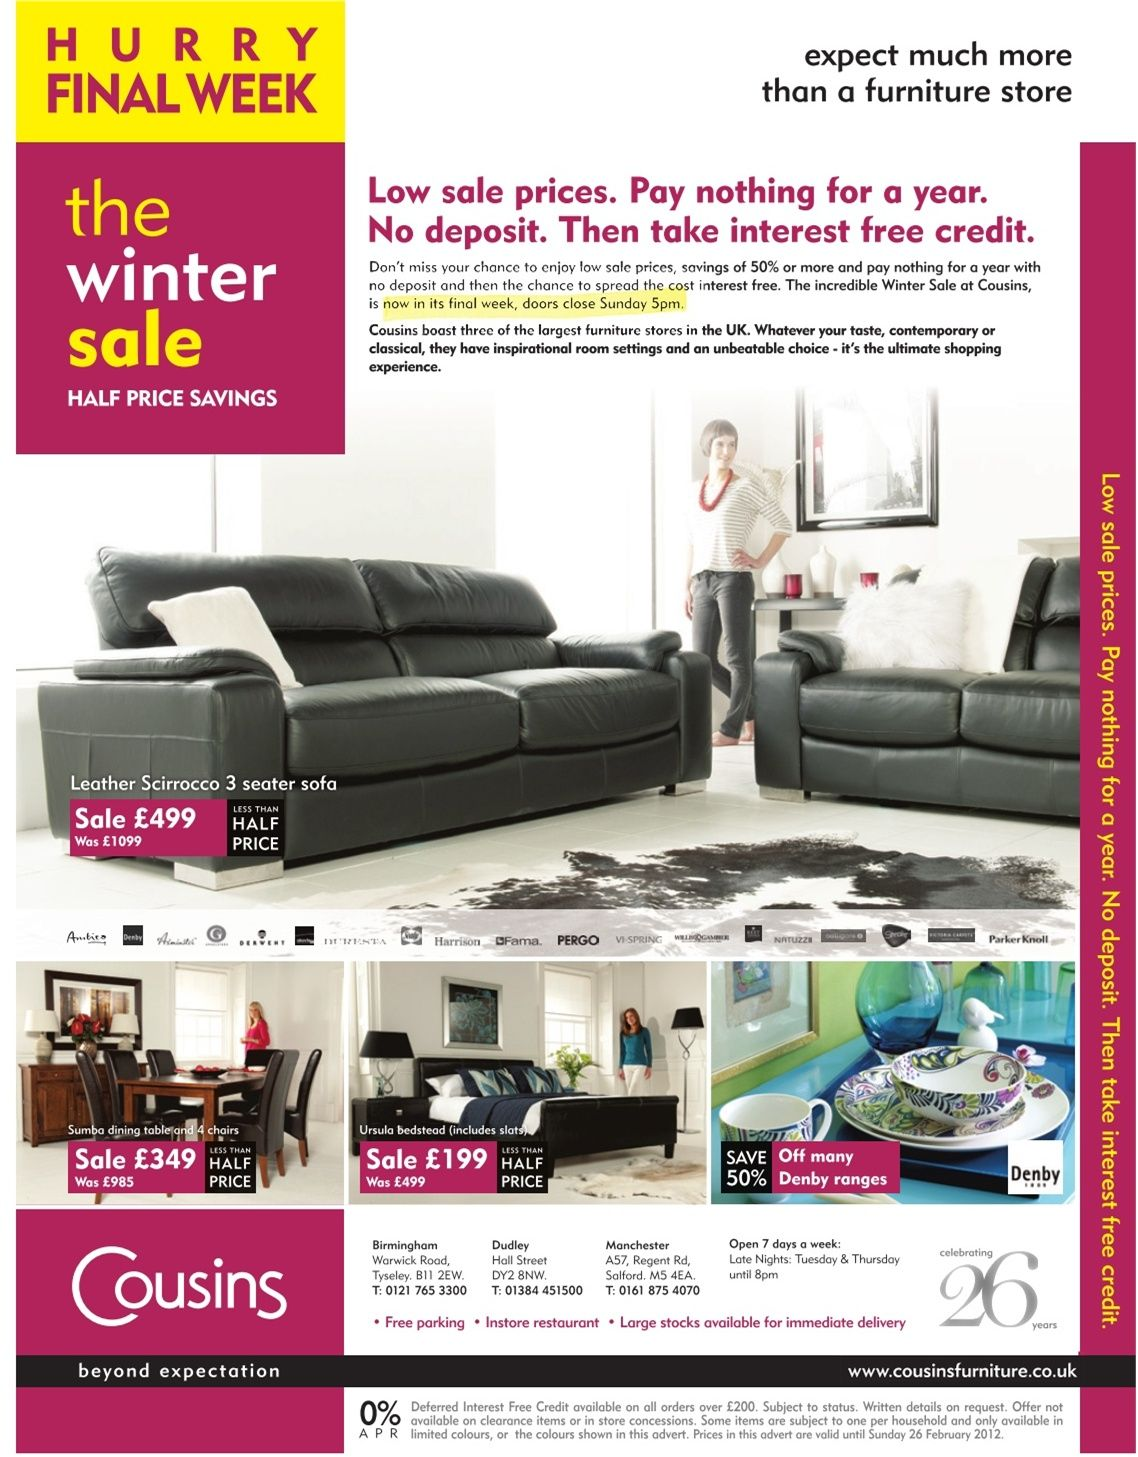 16022012017005jpg 11381457 Furniture Ad Pinterest Ads